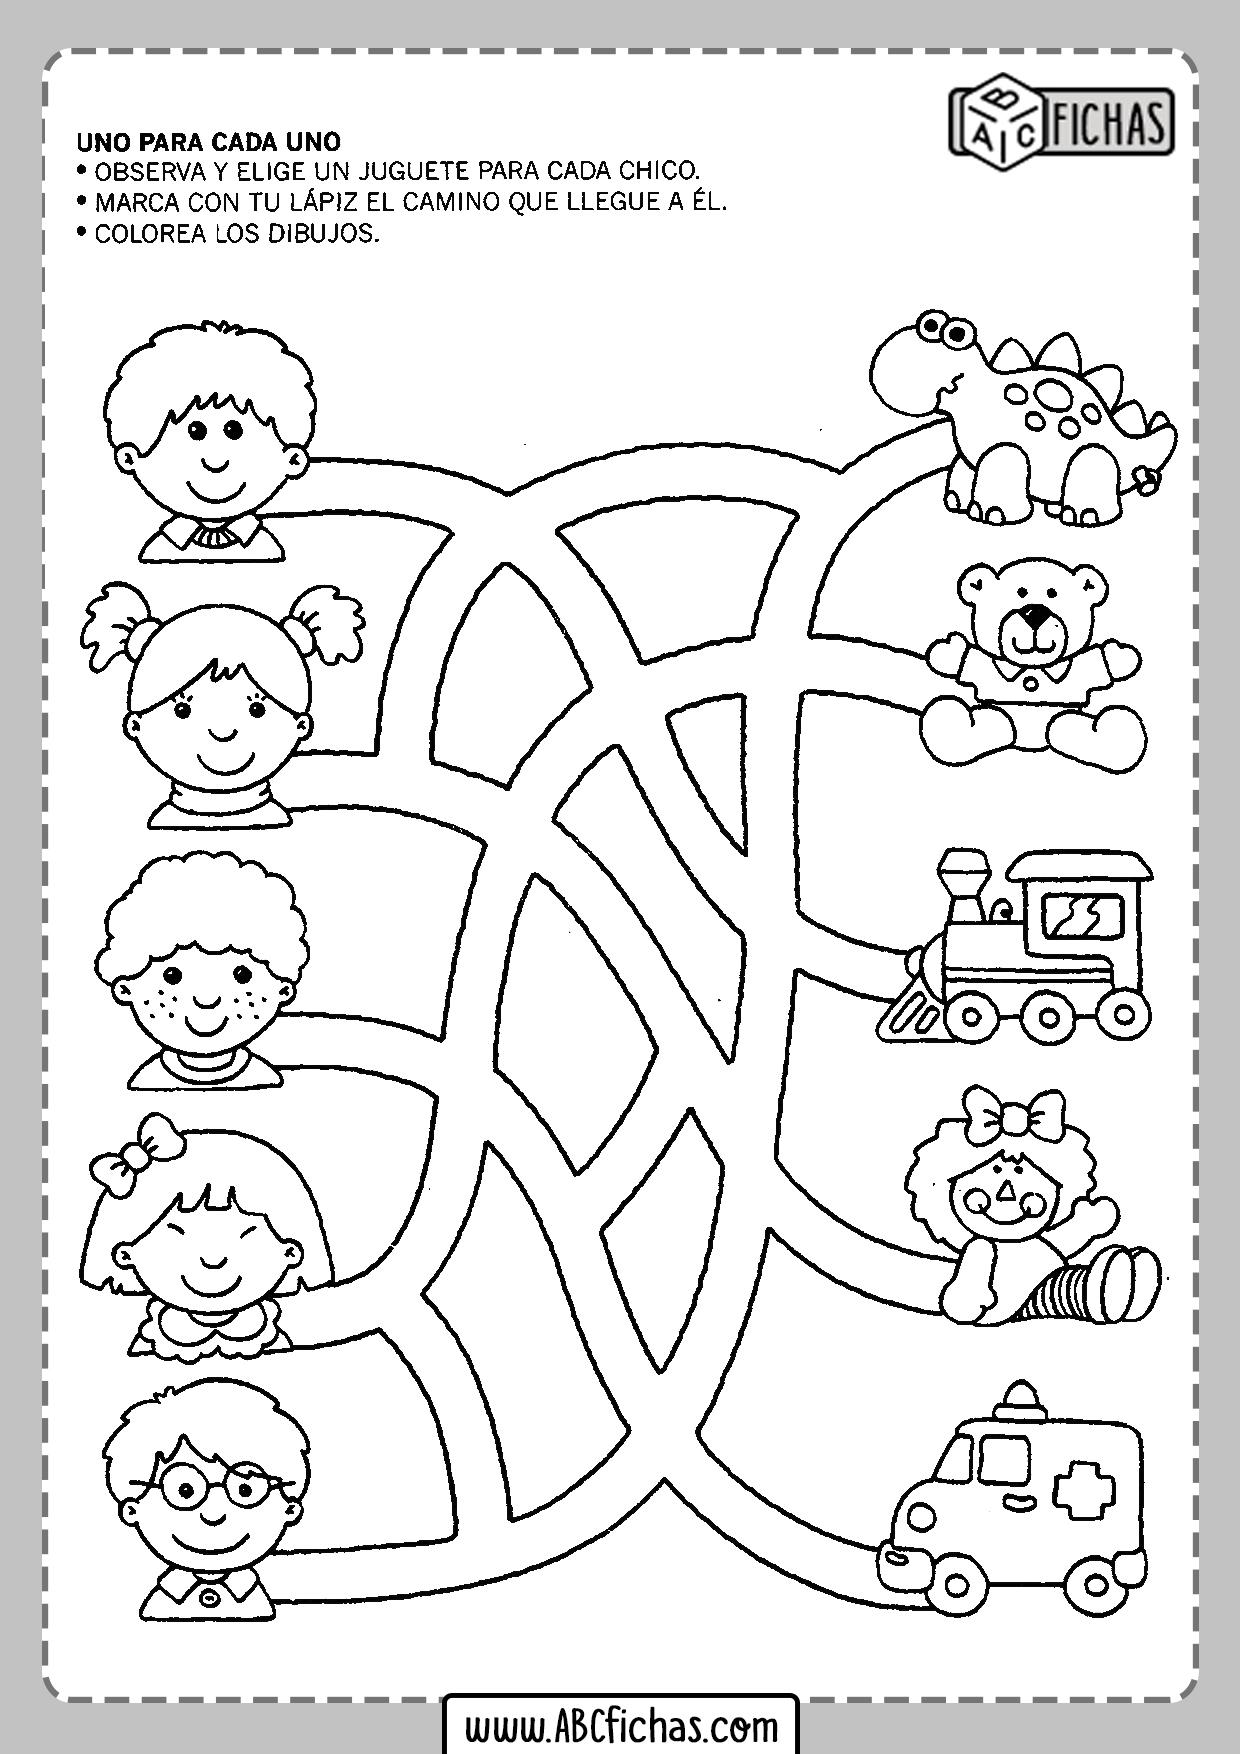 Fichas de preescolar para imprimir